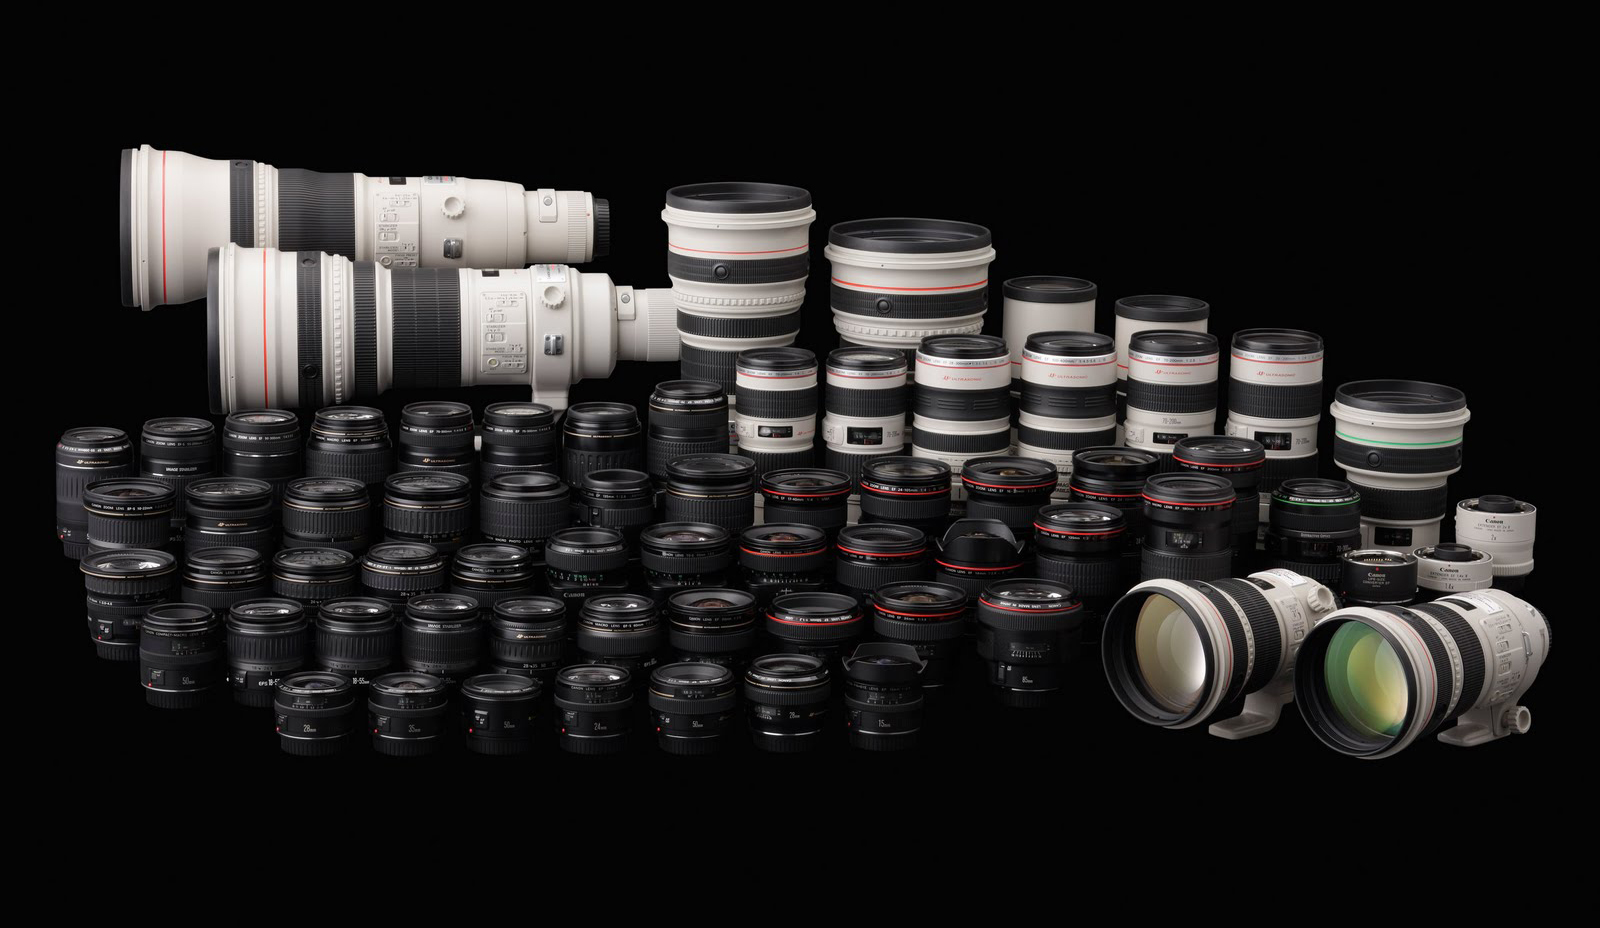 Michael Daniel Ho The Wildlife Tographer Canon Ef 200mm F 2l Tamron 18 35 63 Di Iii Vc Lens For M Is Ii And 800mm 56l